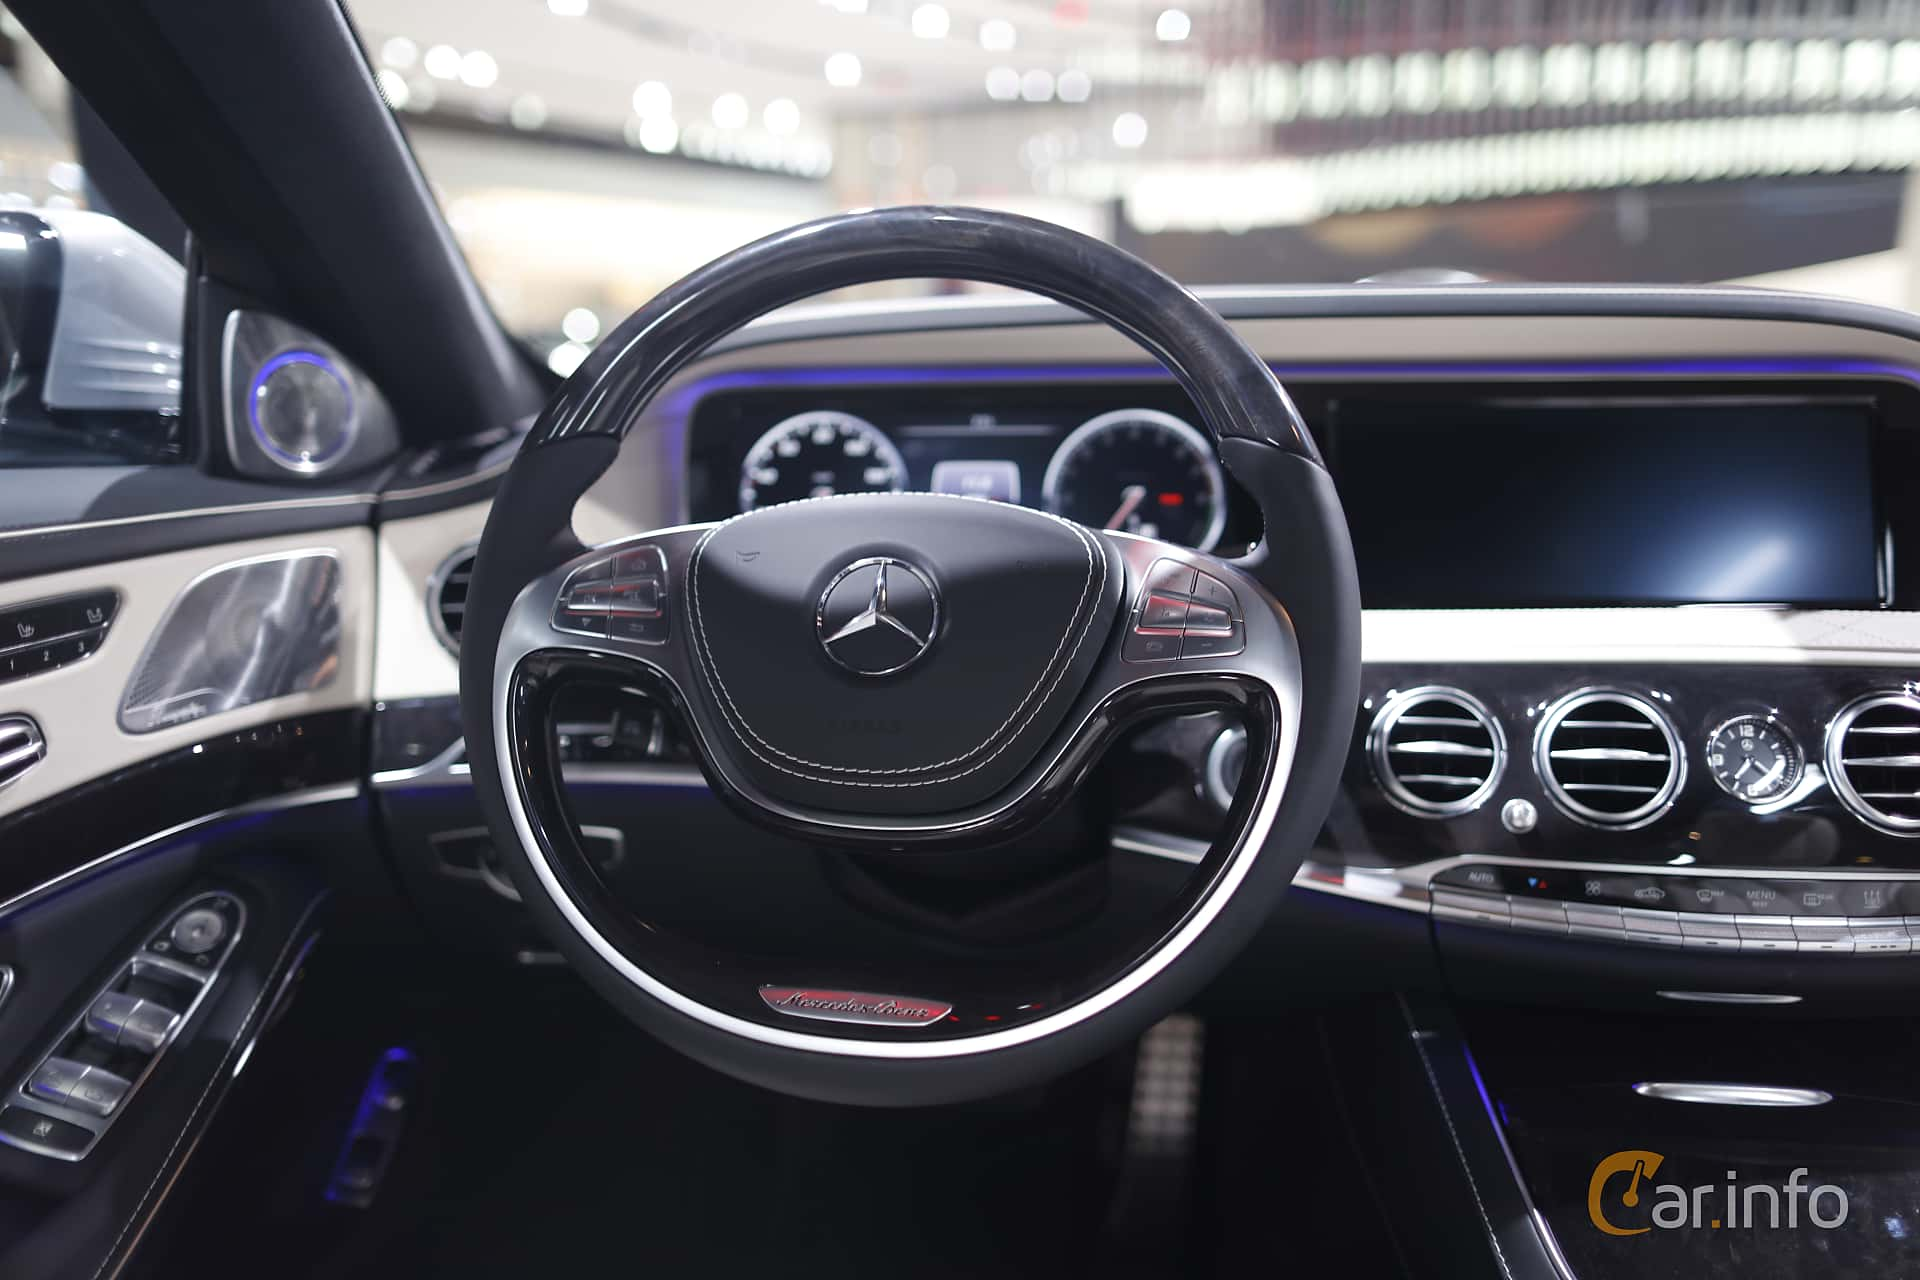 Interiör av Mercedes-Benz S 500 e L 3.0 V6 7G-Tronic Plus, 442ps, 2017 på North American International Auto Show 2017